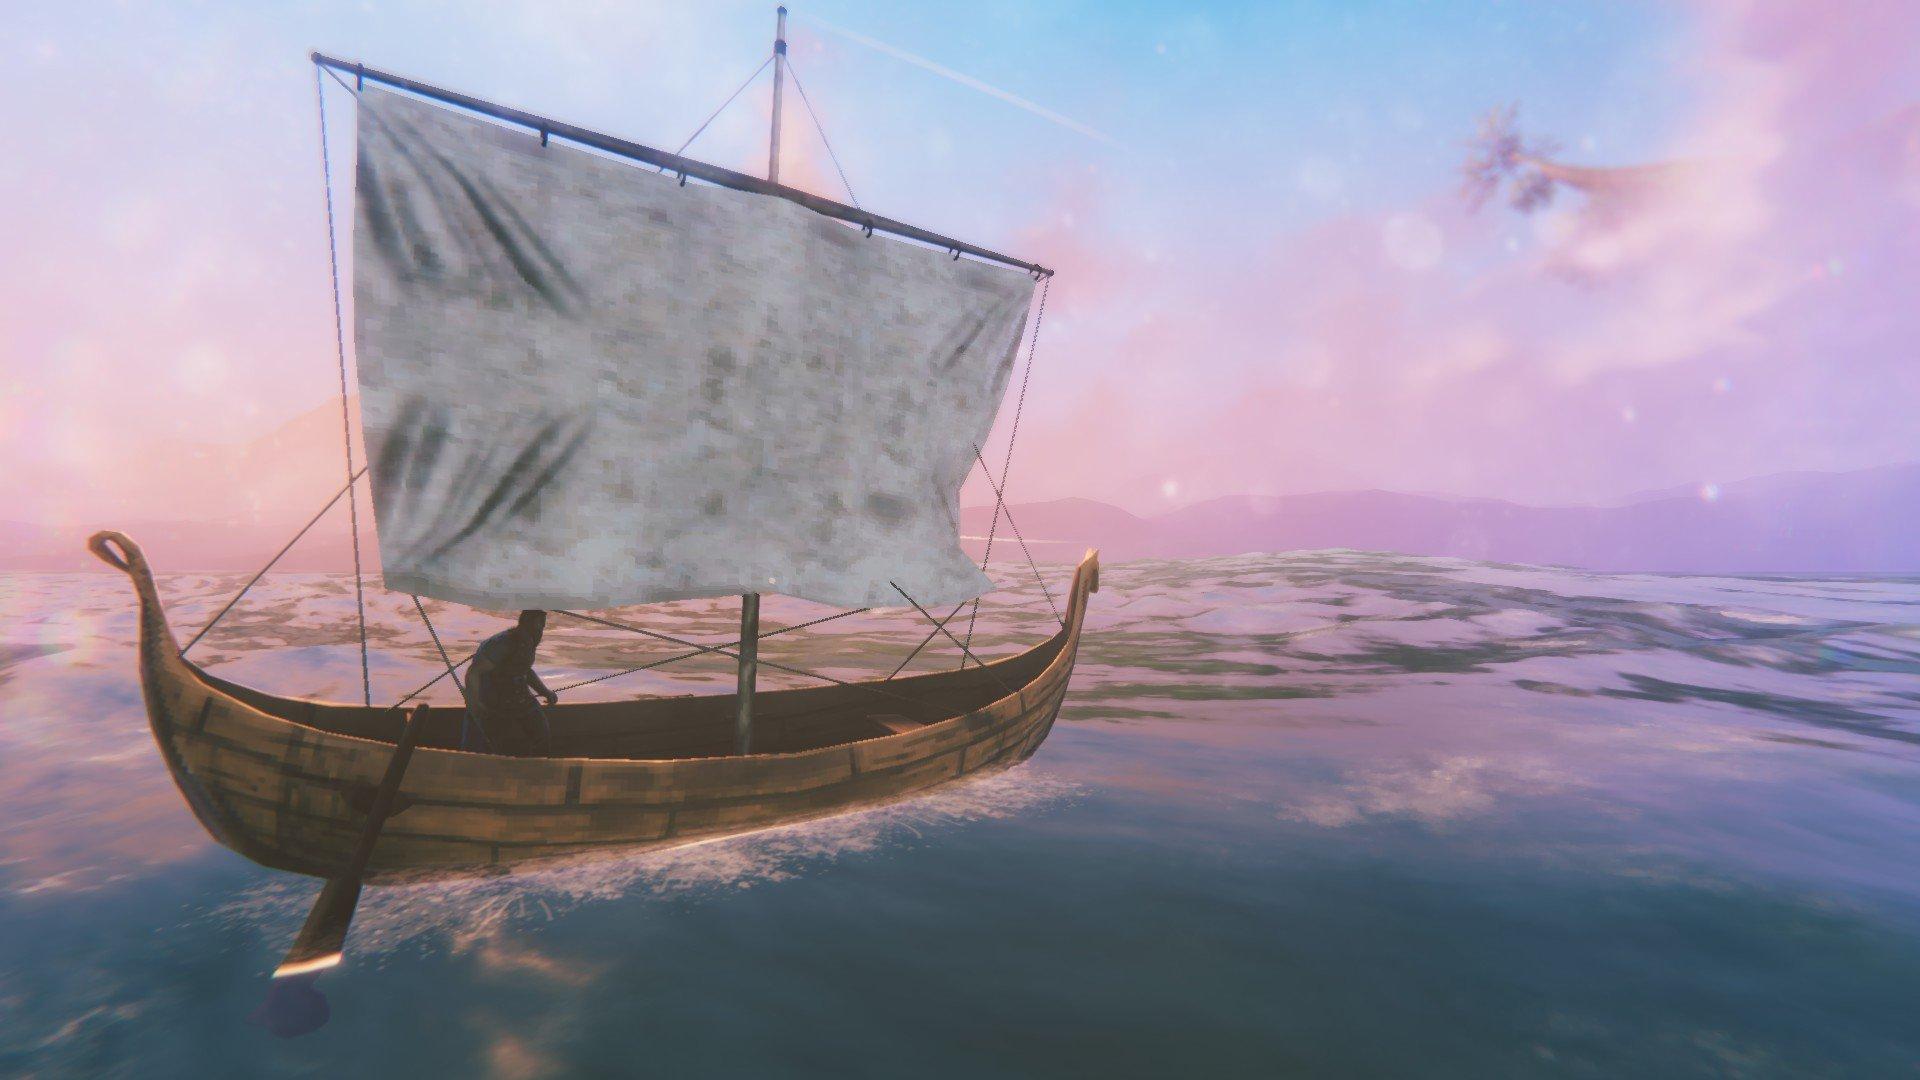 Valheim - Boat Log Out